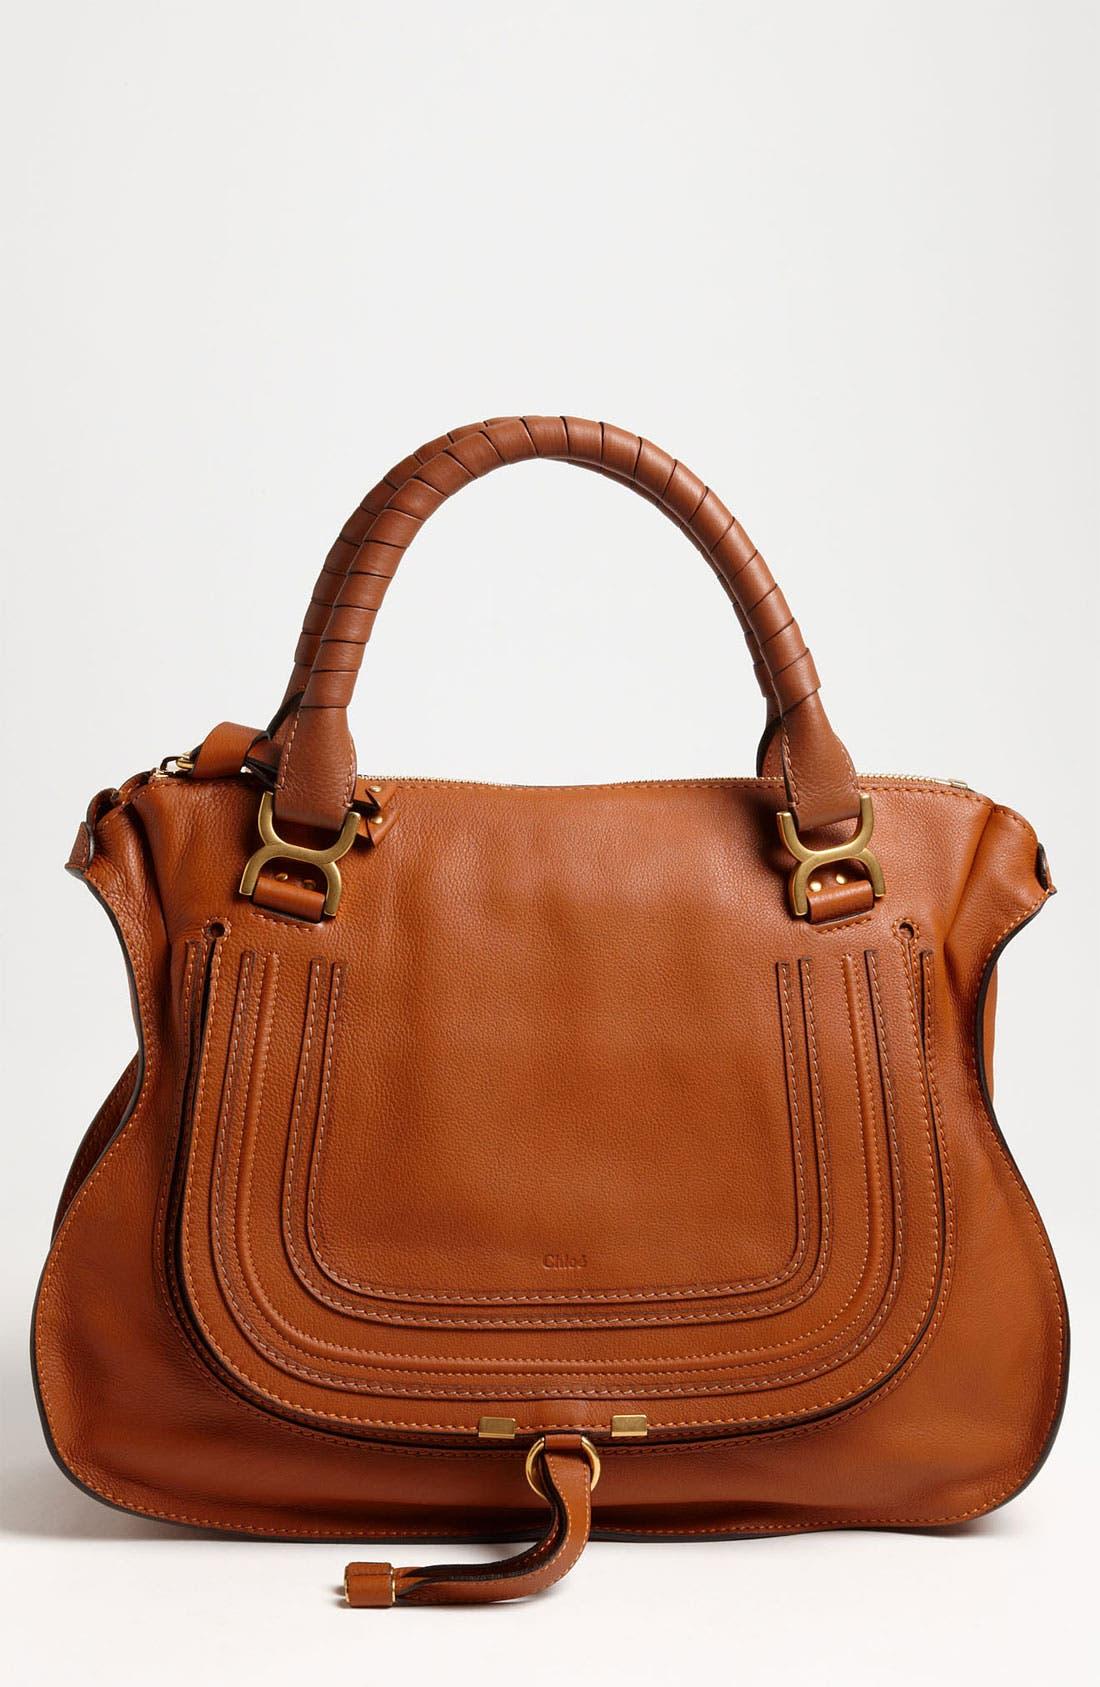 Main Image - Chloé Large Marcie Leather Satchel